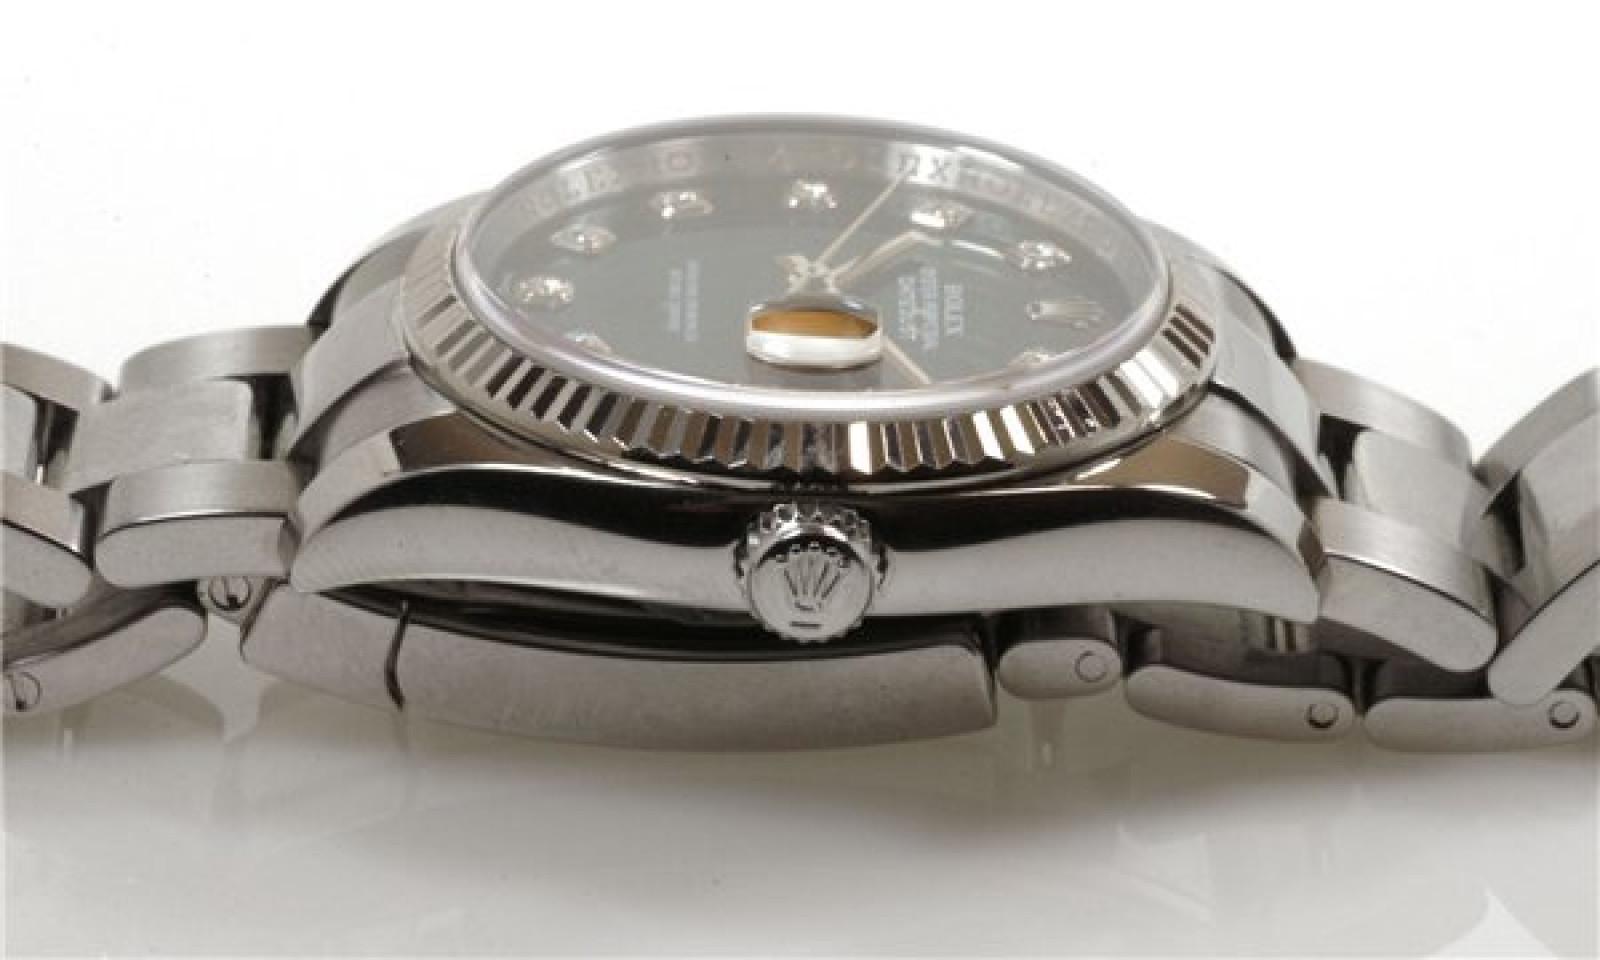 Pre-Owned Diamond Rolex Datejust 116234